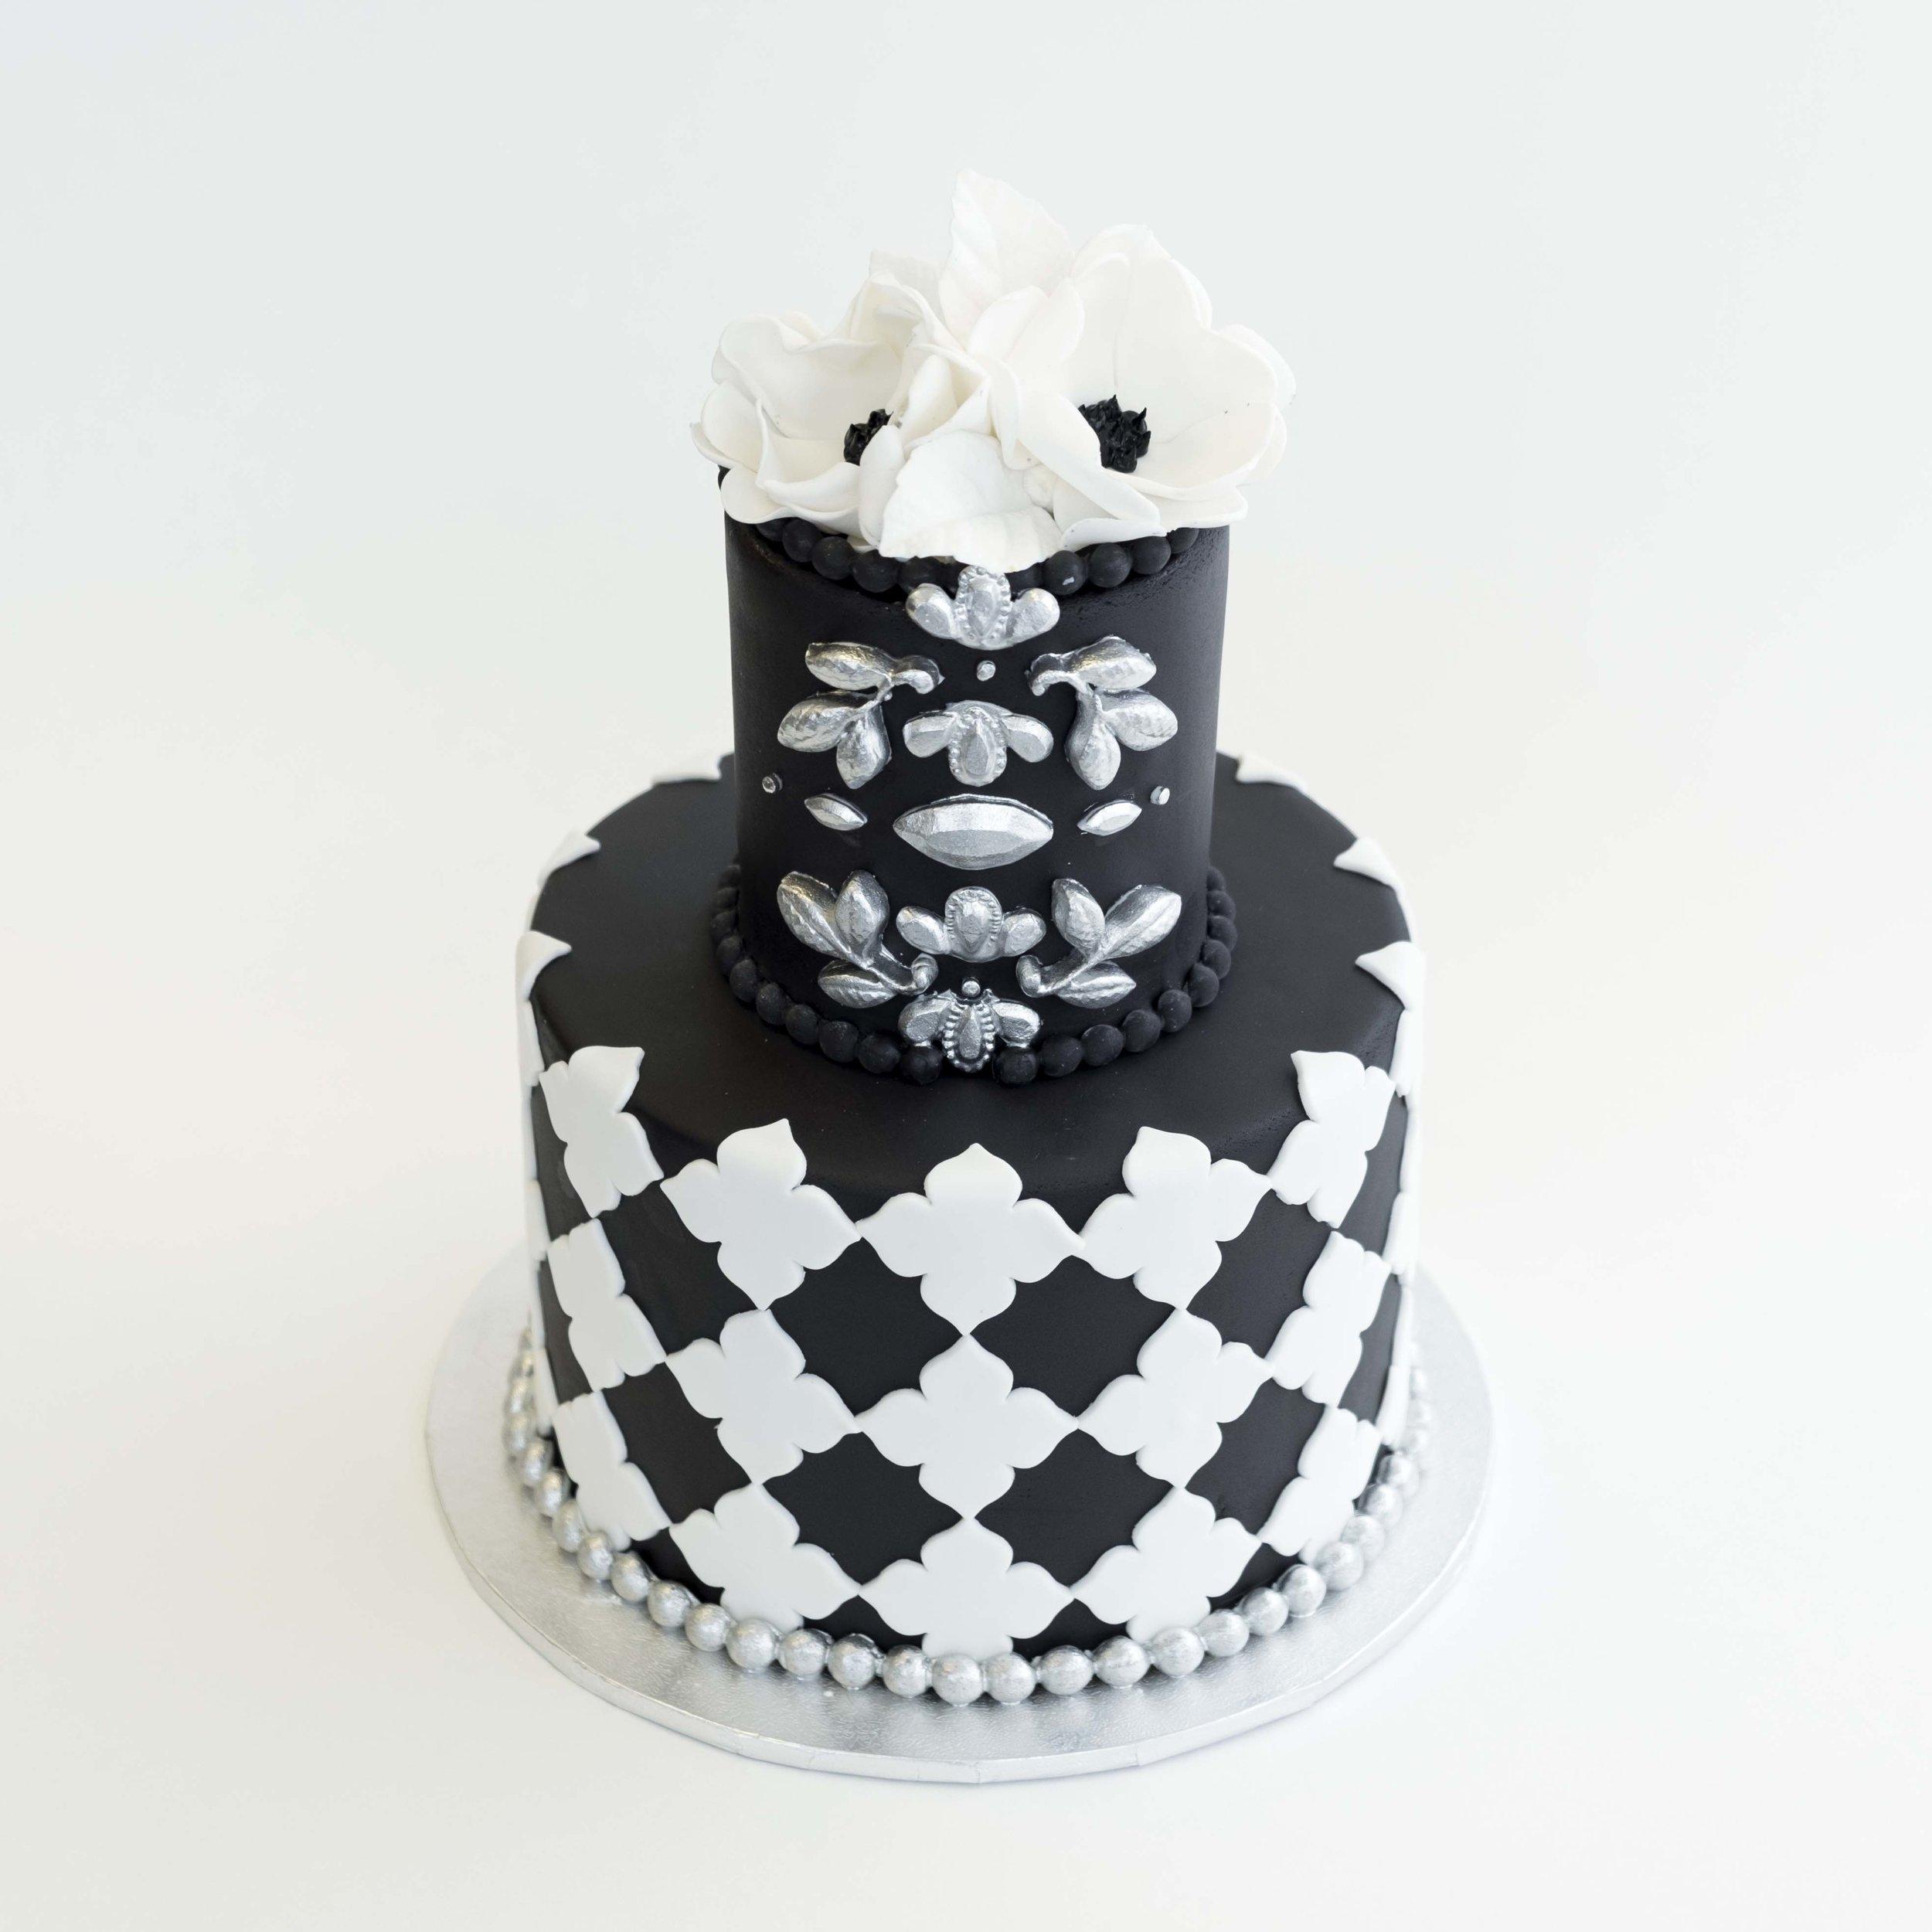 pretty little tiered cake 3.jpg